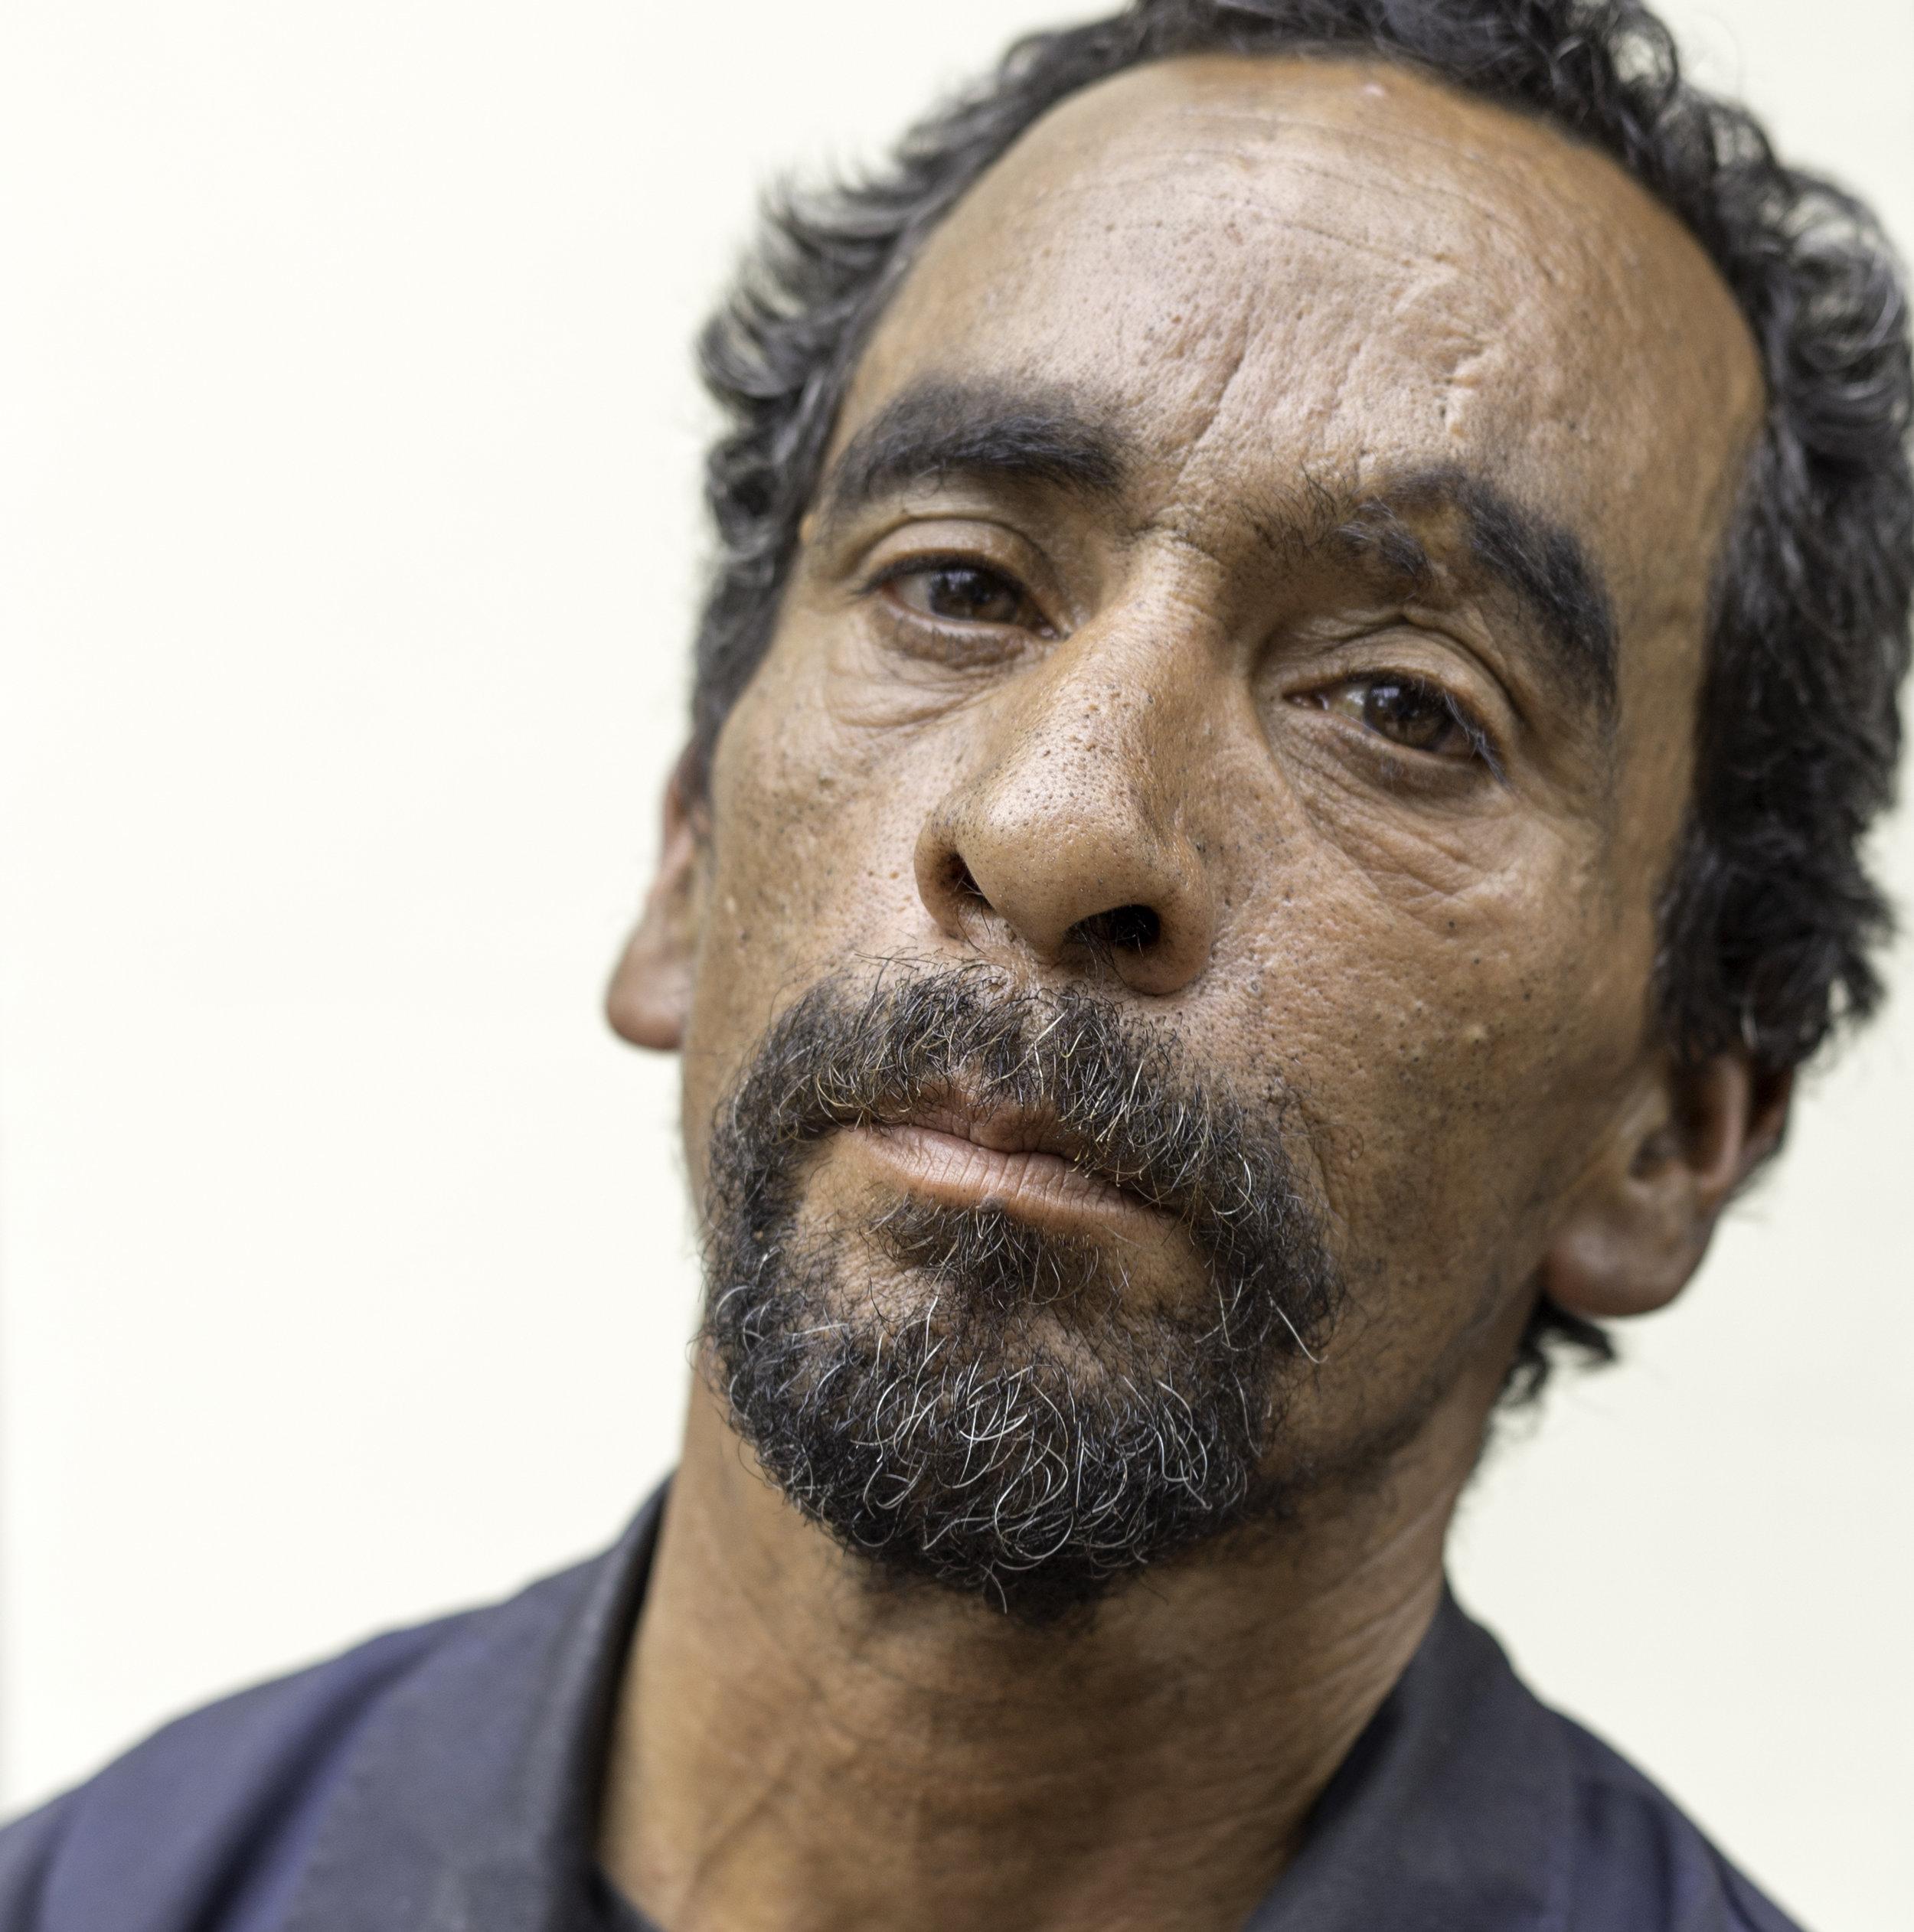 Scary homeless dude.jpg